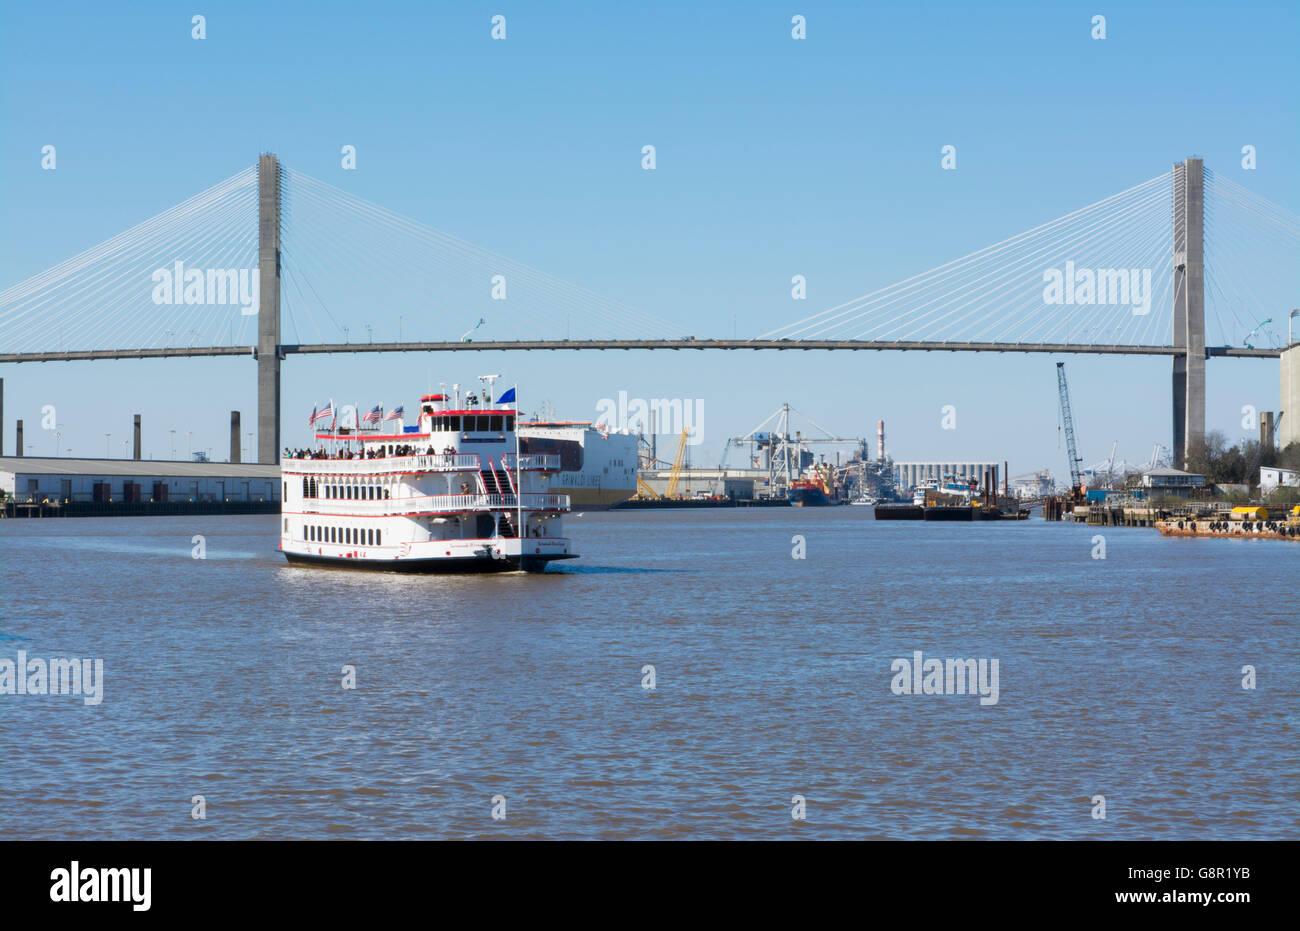 Savannah Georgia riverboat ride and the Talmadge Memorial Bridge with tourist boat Savannah Riverqueen on the Savannah - Stock Image